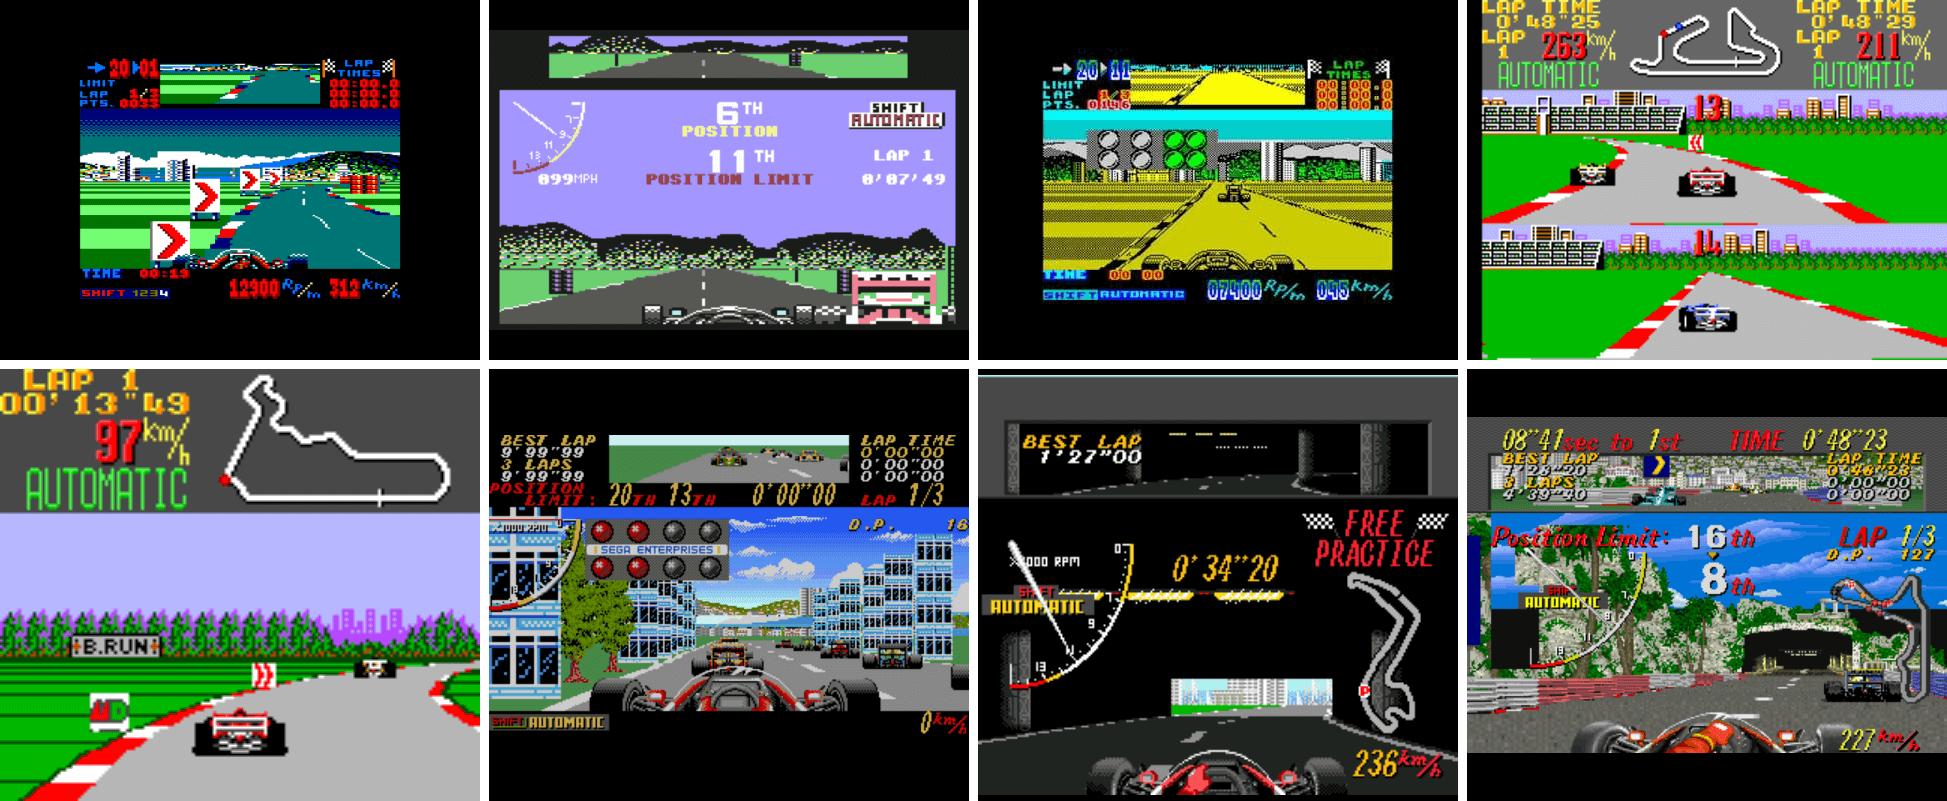 Image For Post | Amstrad - C64 - Spectrum - Sega Master System Game Gear - Amiga - Megadrive - Arcade